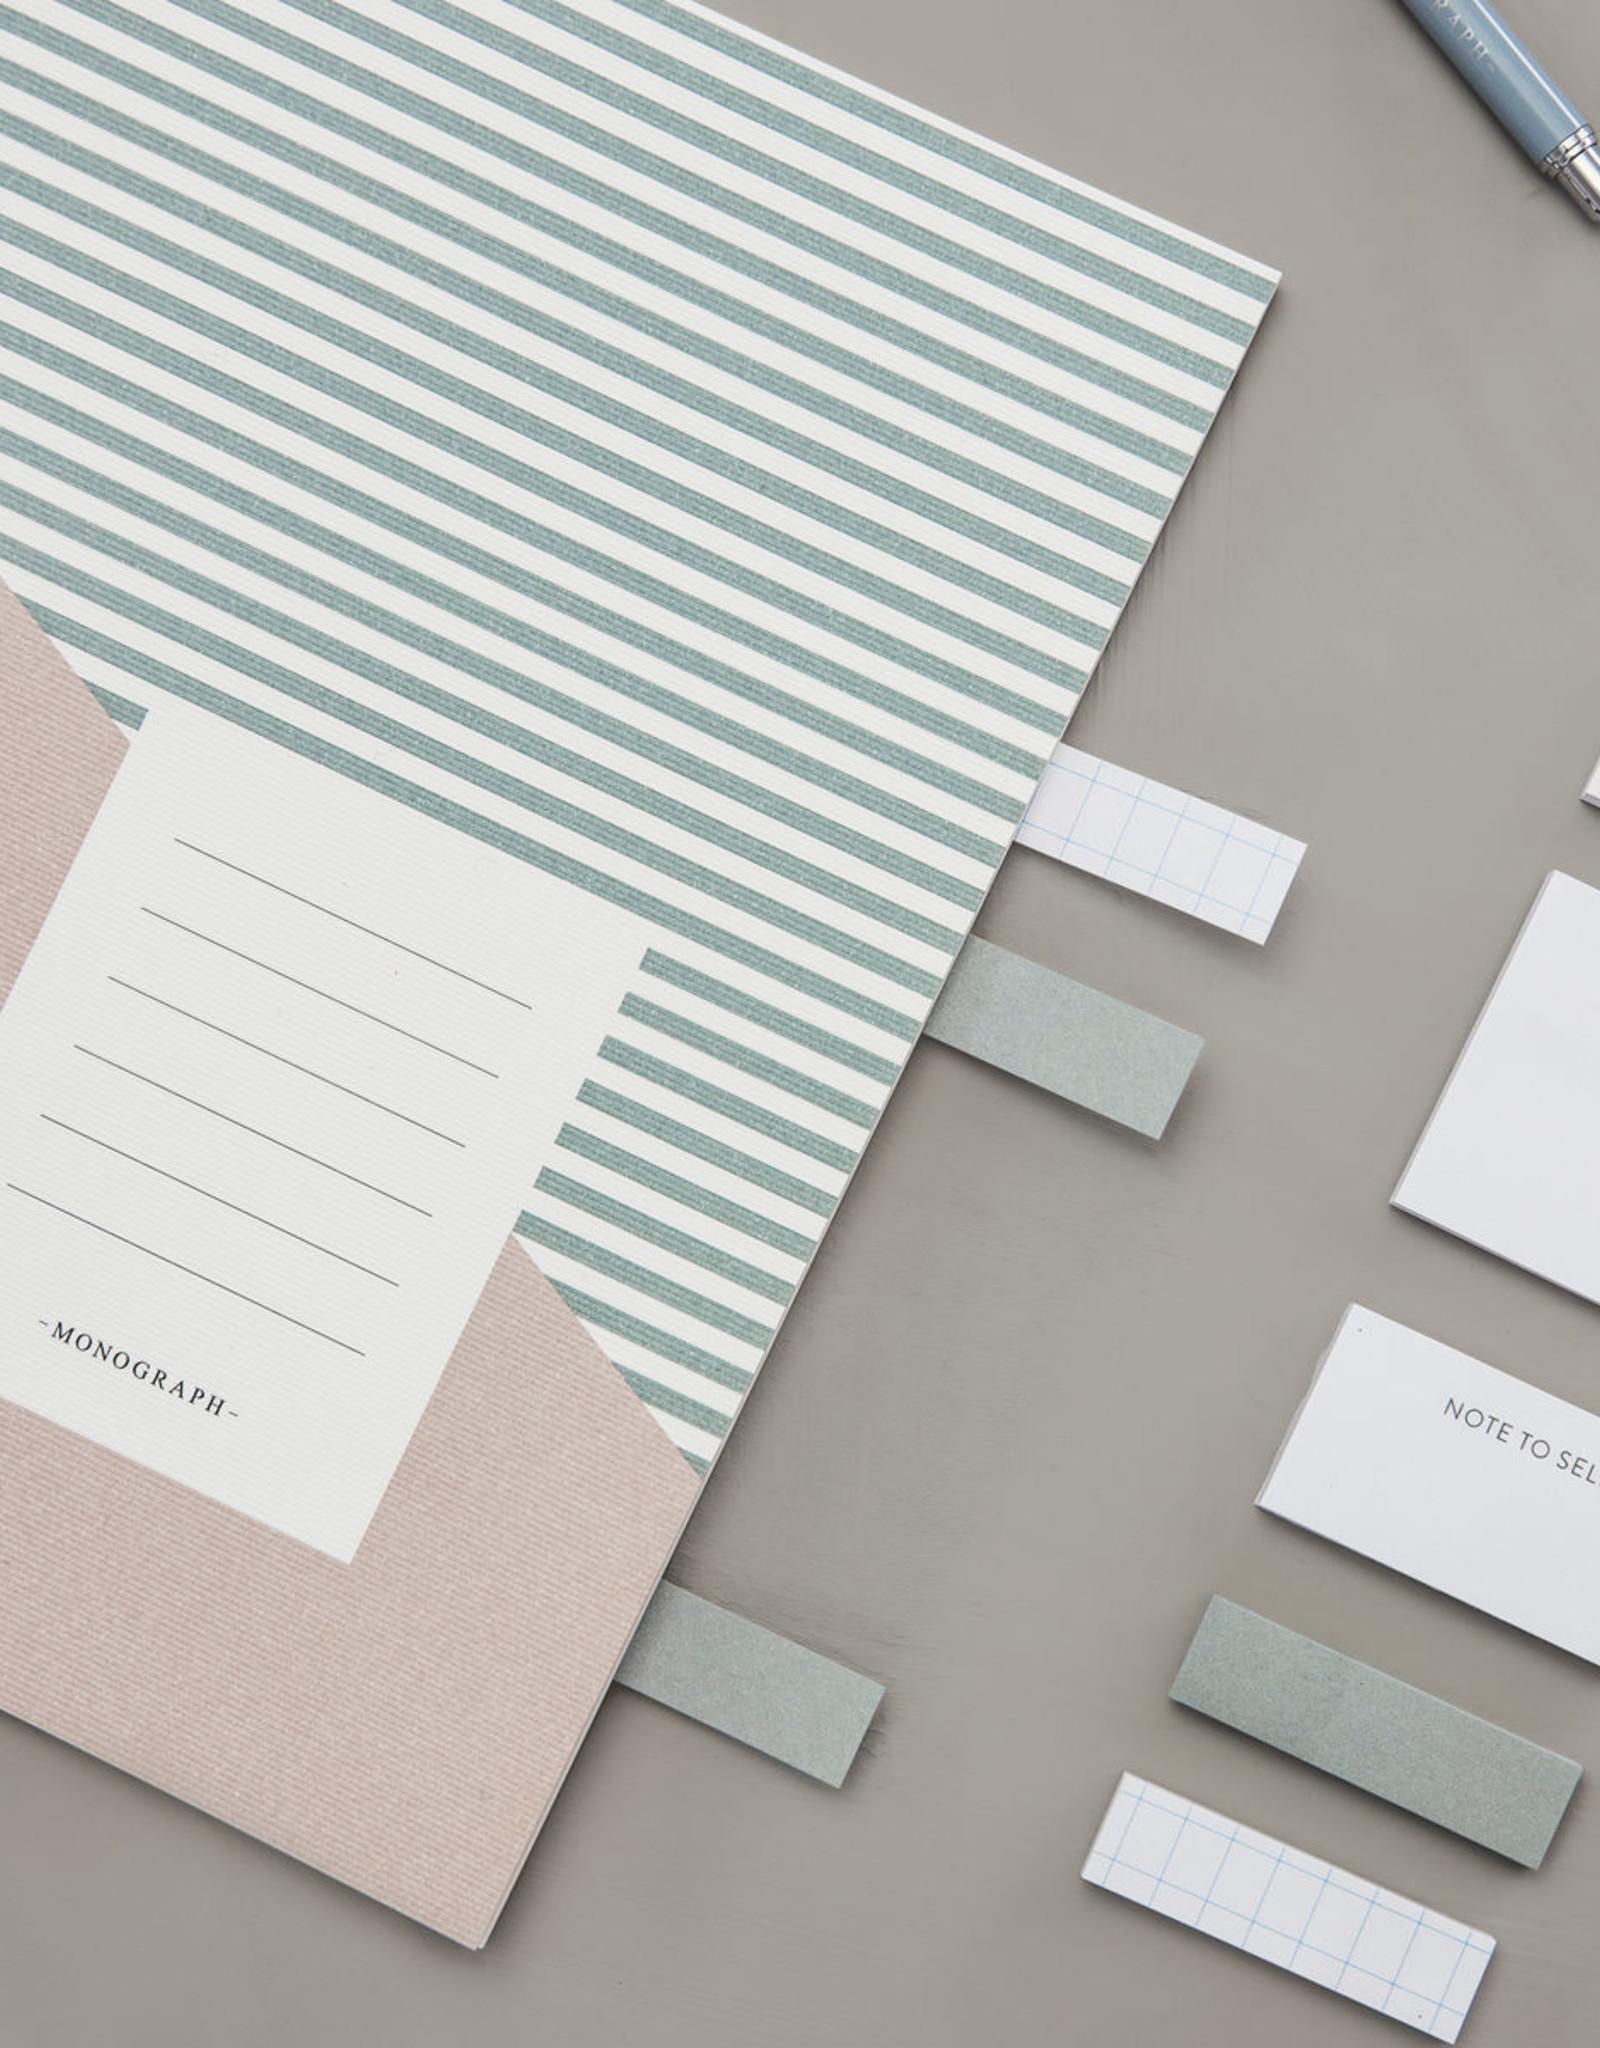 Monograph Monograph Note book Stripes Combo 2 A5 Set of 2 designs